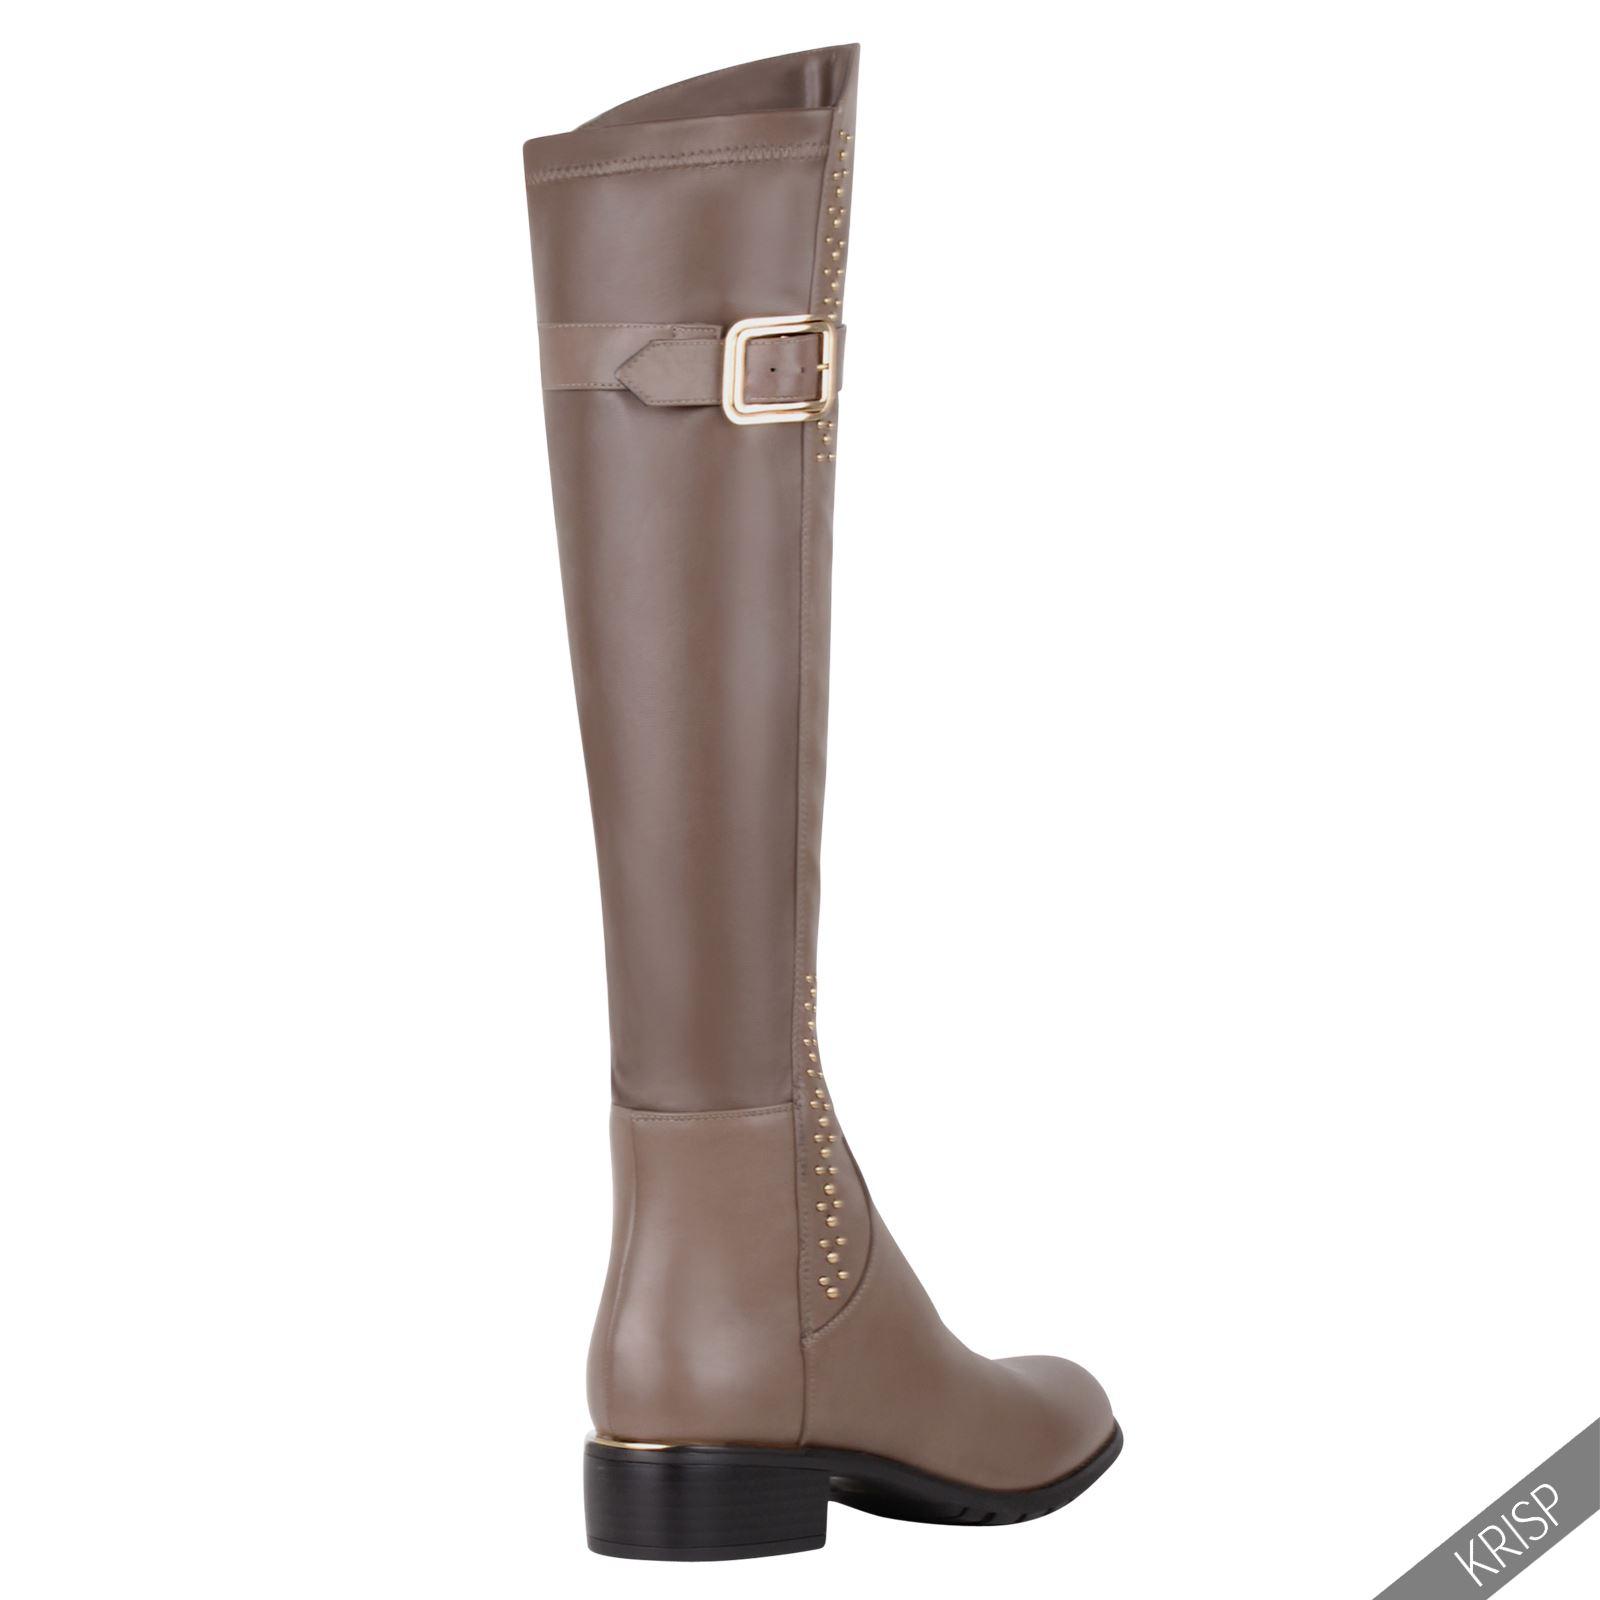 1b947dd767f Womens Tassel Stretch Over Knee High Boots Low Heel Ladies Winter ...